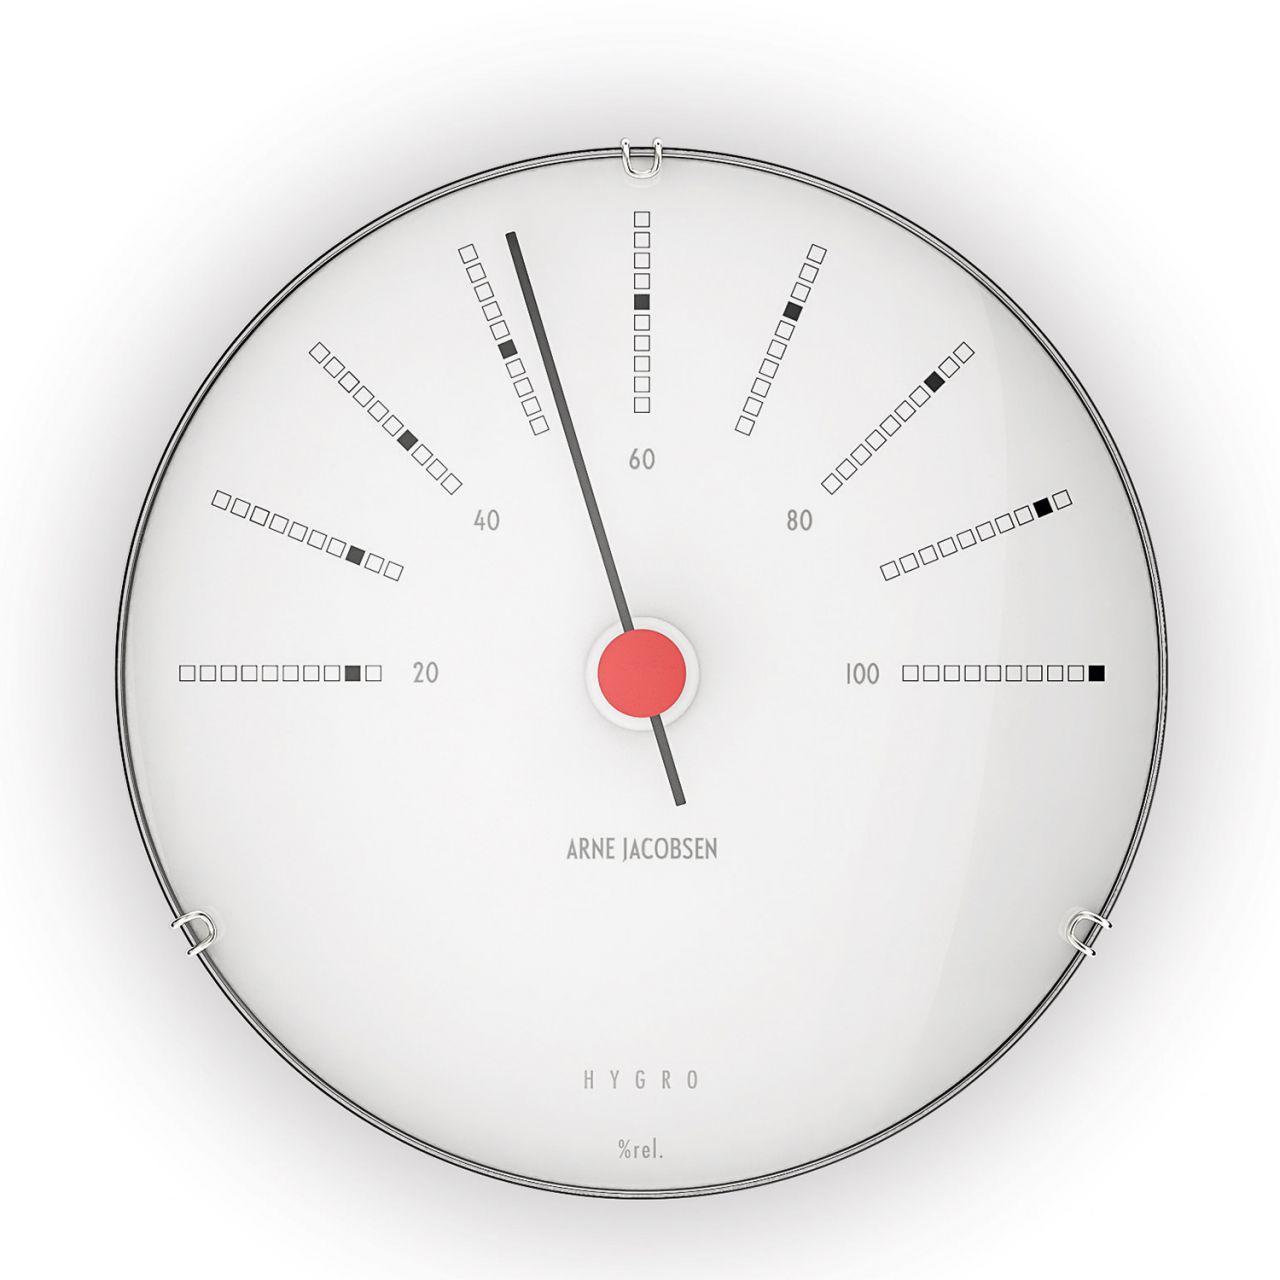 Arne Jacobsen - Bankers Hygrometer Wetterstation 43685